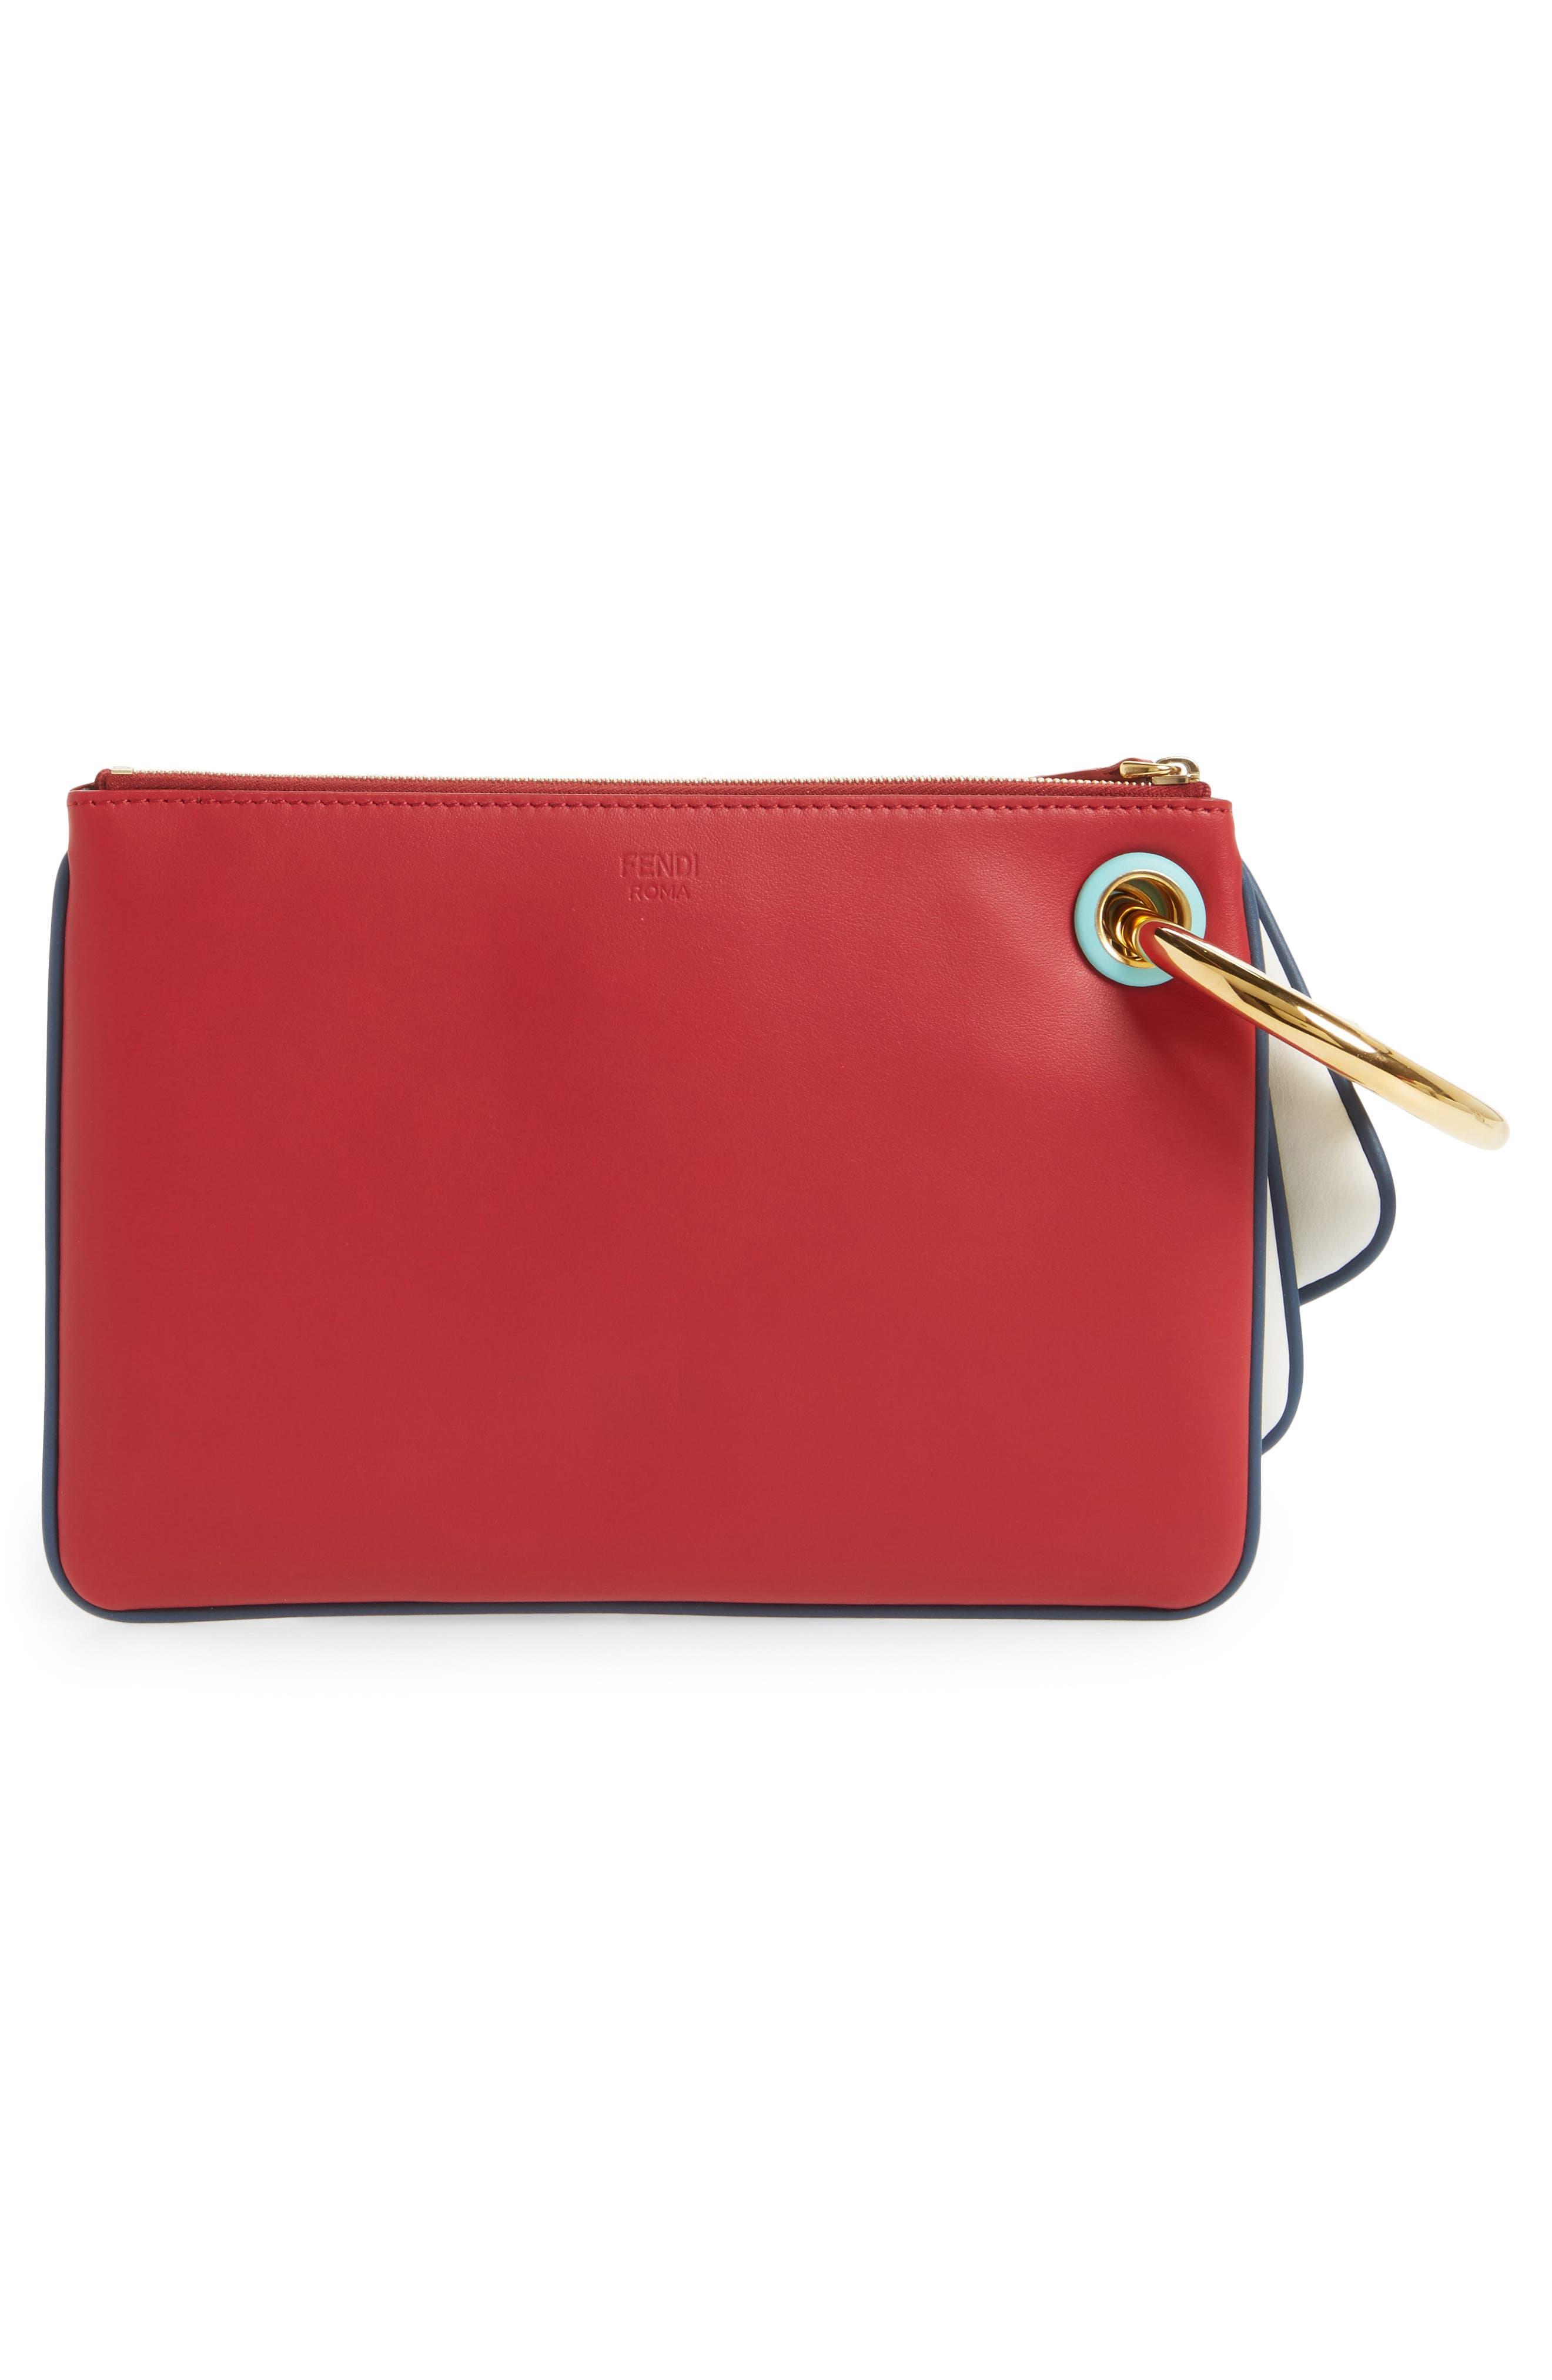 Set of Three Calfskin Leather & Genuine Python Pouches,                             Alternate thumbnail 2, color,                             Red/ White/ Python